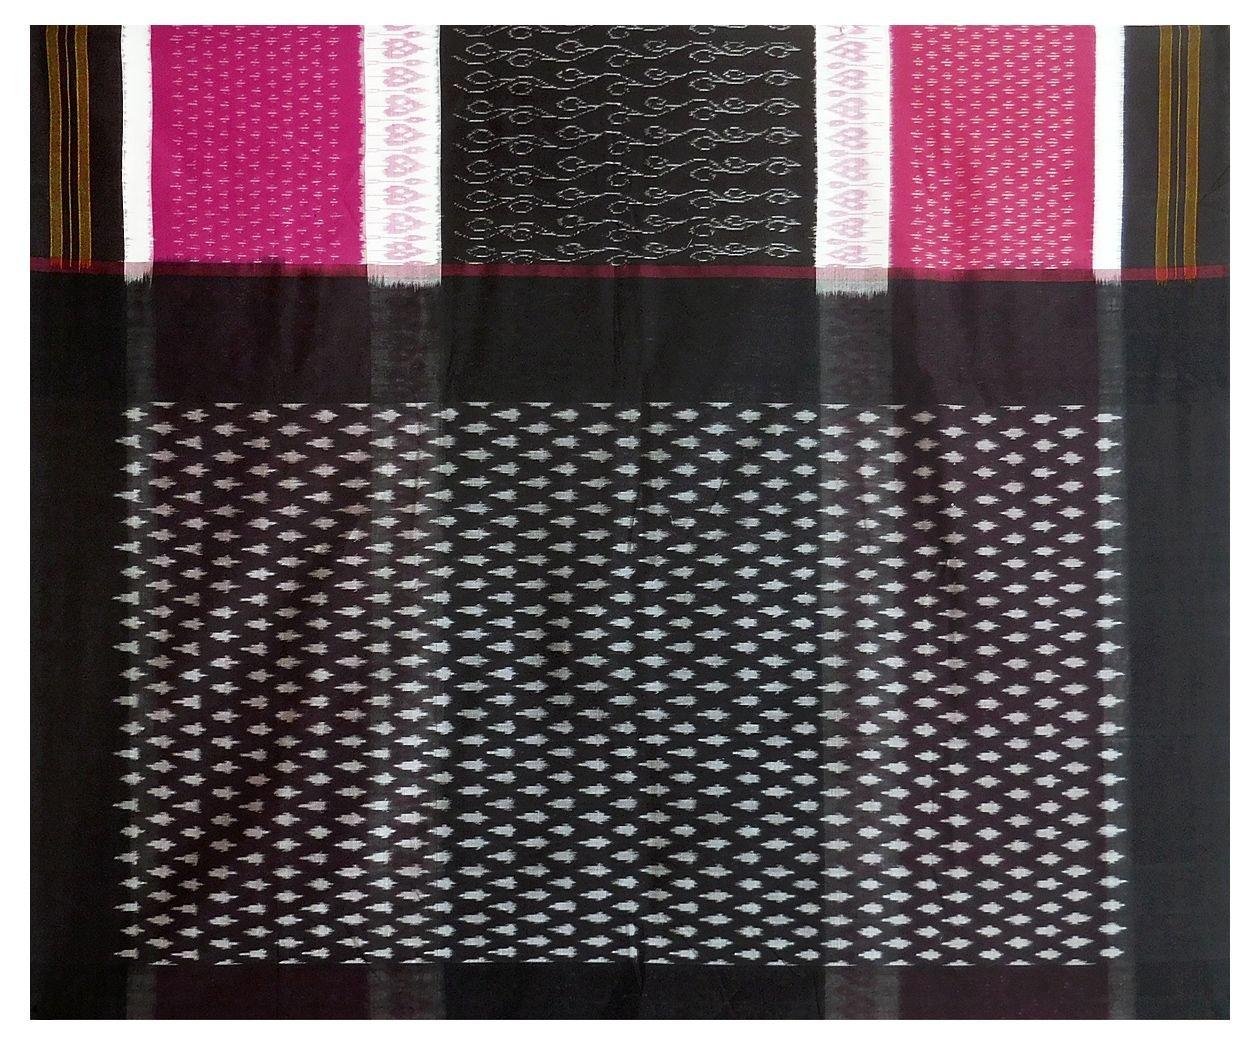 DollsofIndia Ikkat Design on Orissa Cotton Saree (OX53) - Black, Red, White by DollsofIndia (Image #3)